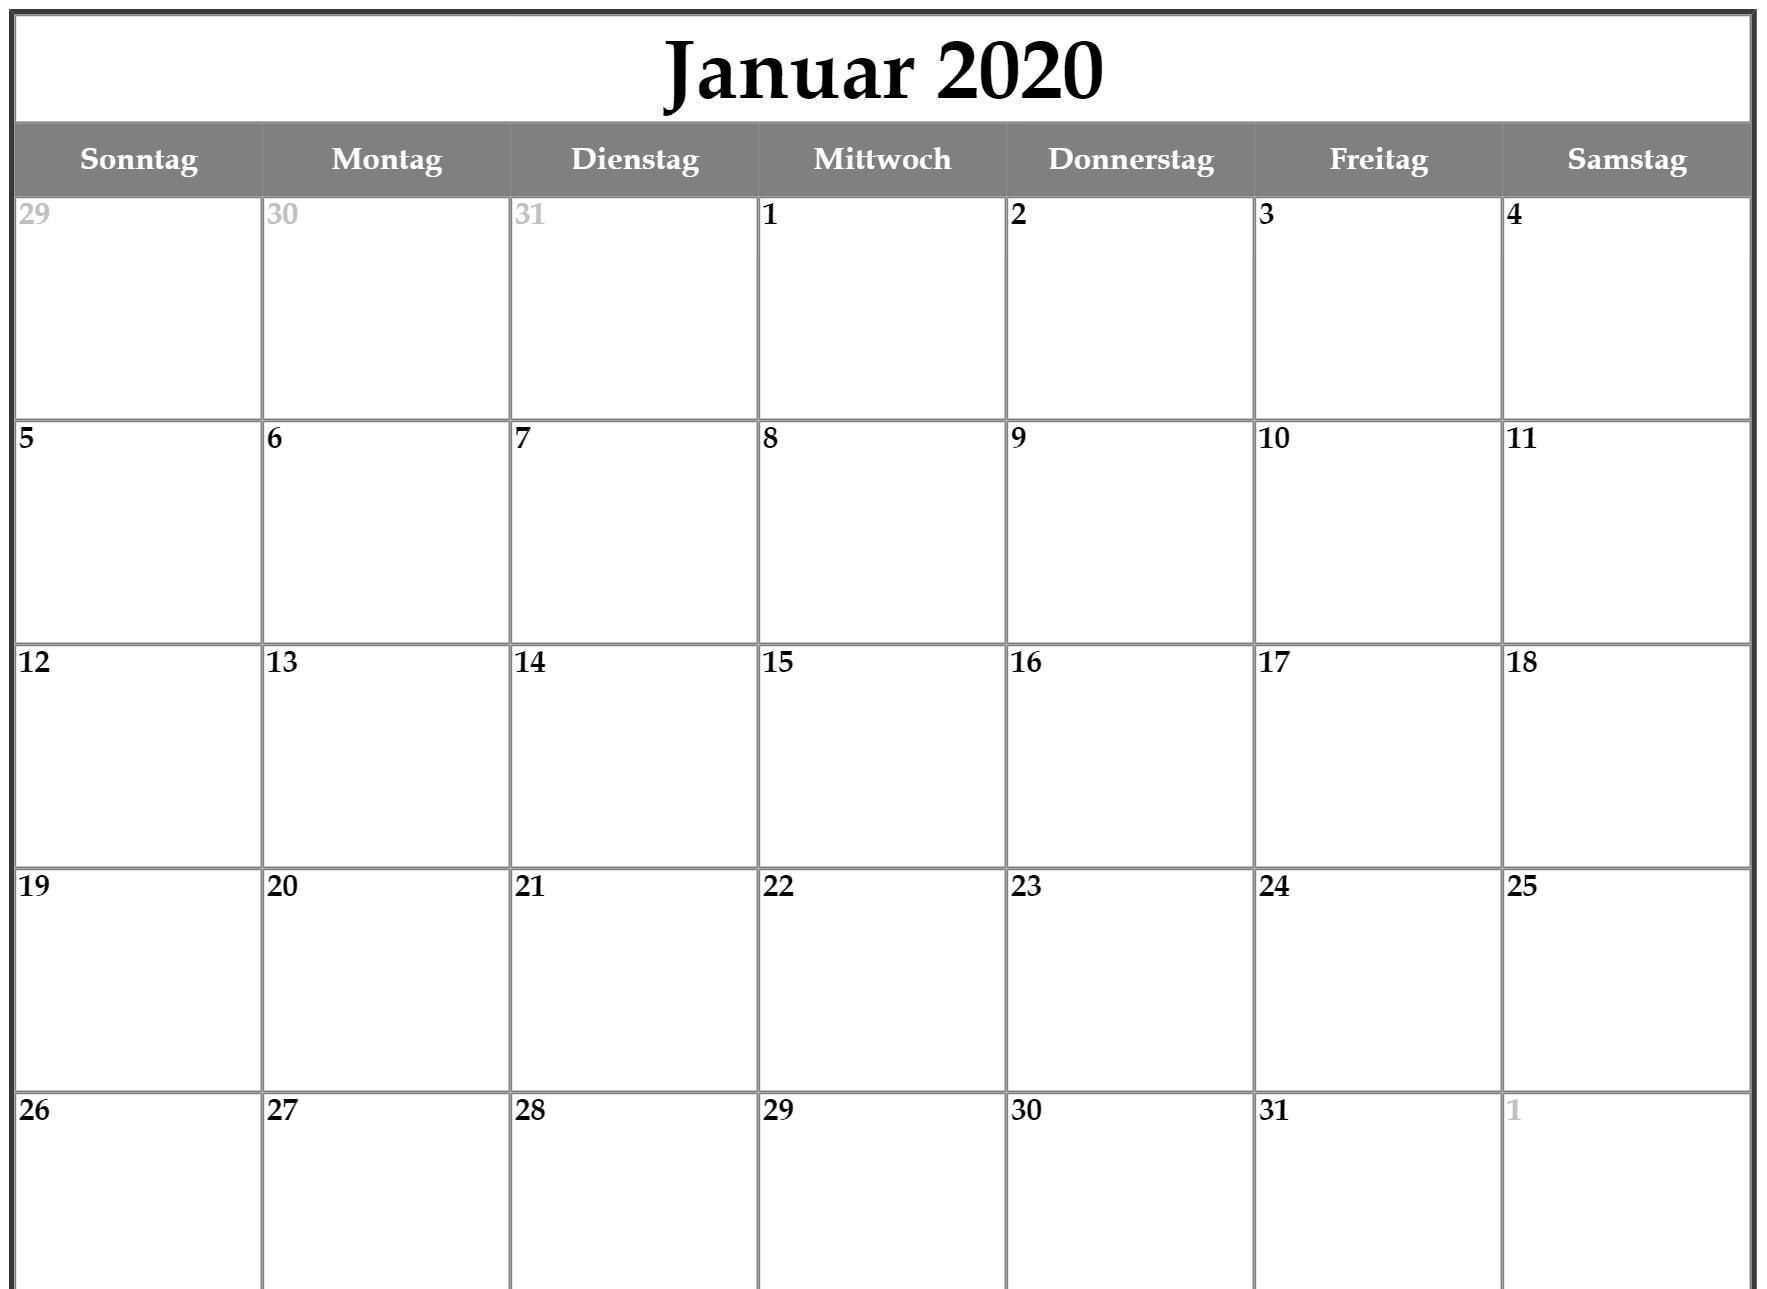 Januar 2020 Kalender Mit Feiertagen Kalender Vorlagen Kalender Feiertage Druckbarer Kalender